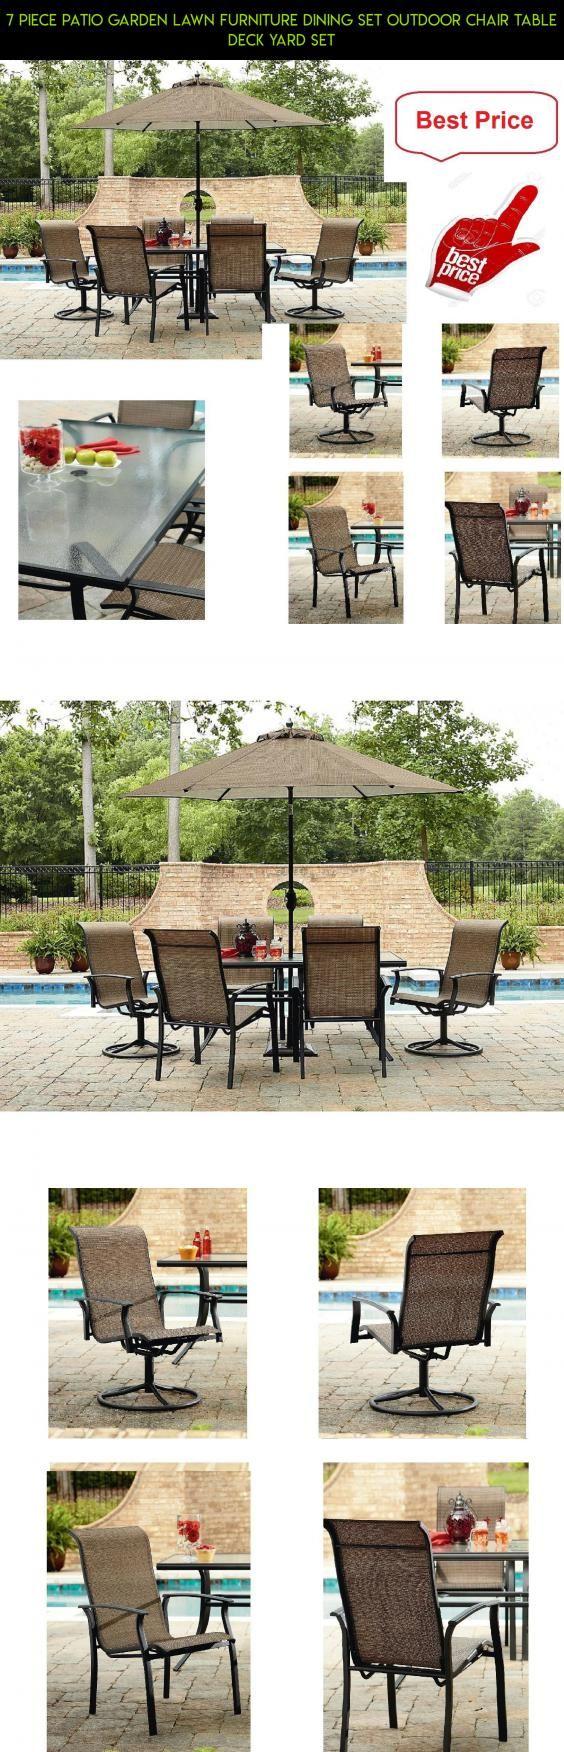 7 Piece Patio Garden Lawn Furniture Dining Set Outdoor Chair Table Deck  Yard Set #tech